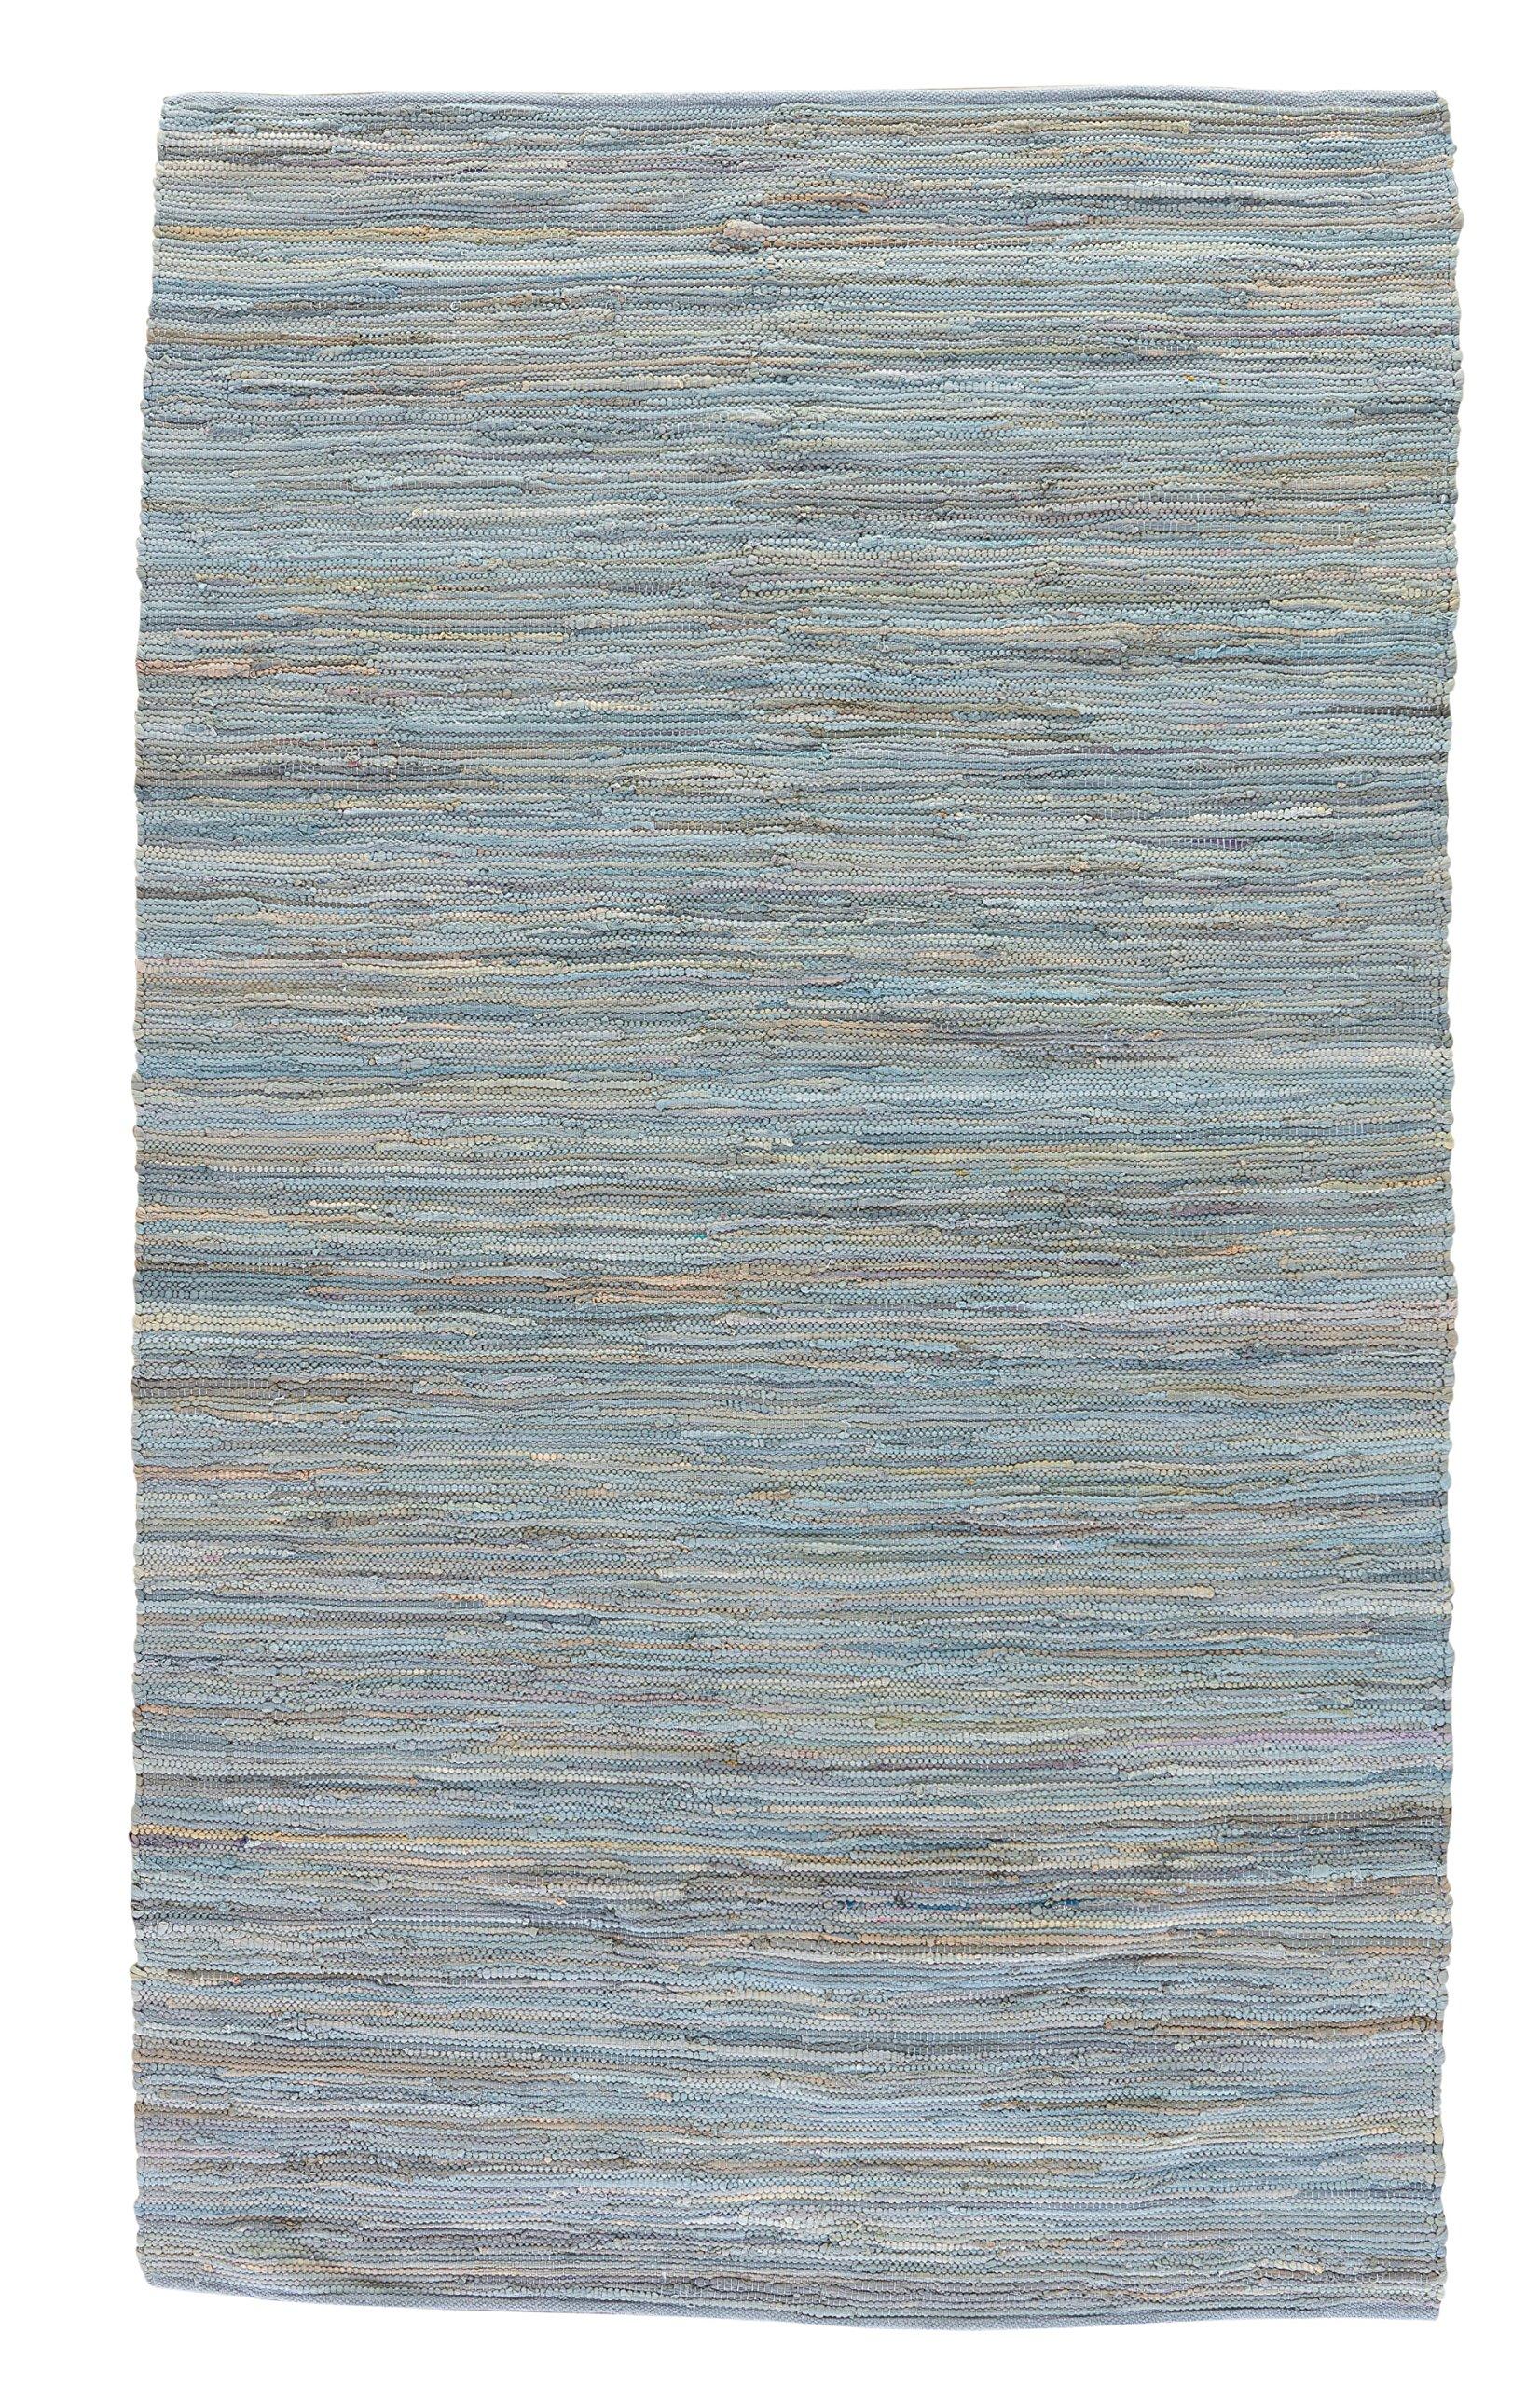 Flat Weave Area Rugs Amazon Com